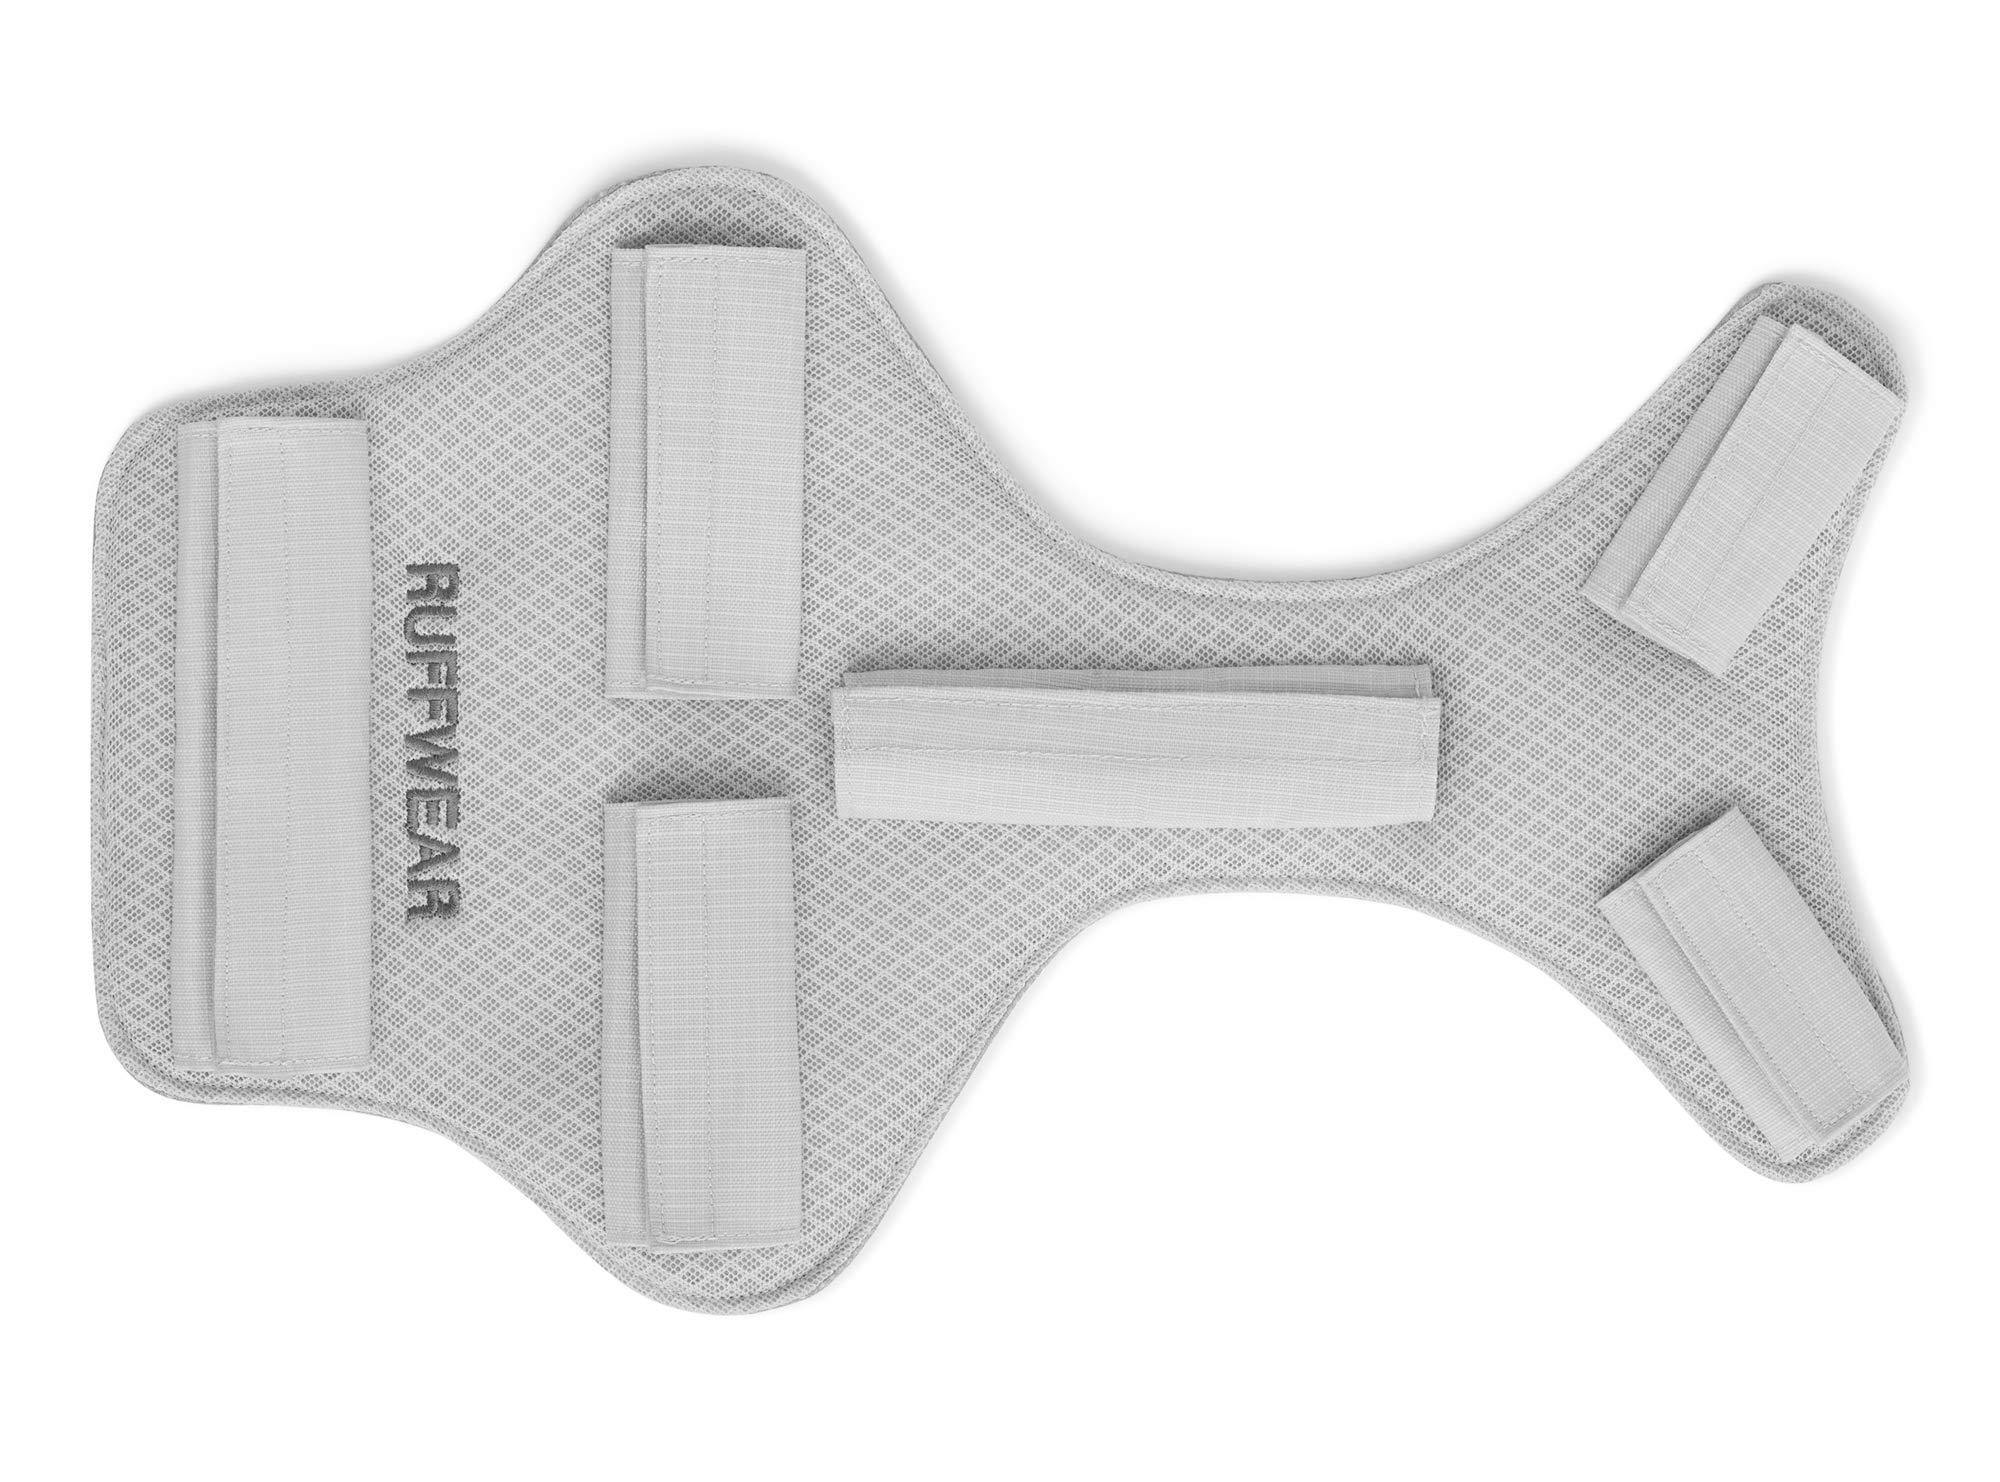 RUFFWEAR - Core Cooler, Graphite Gray, Medium